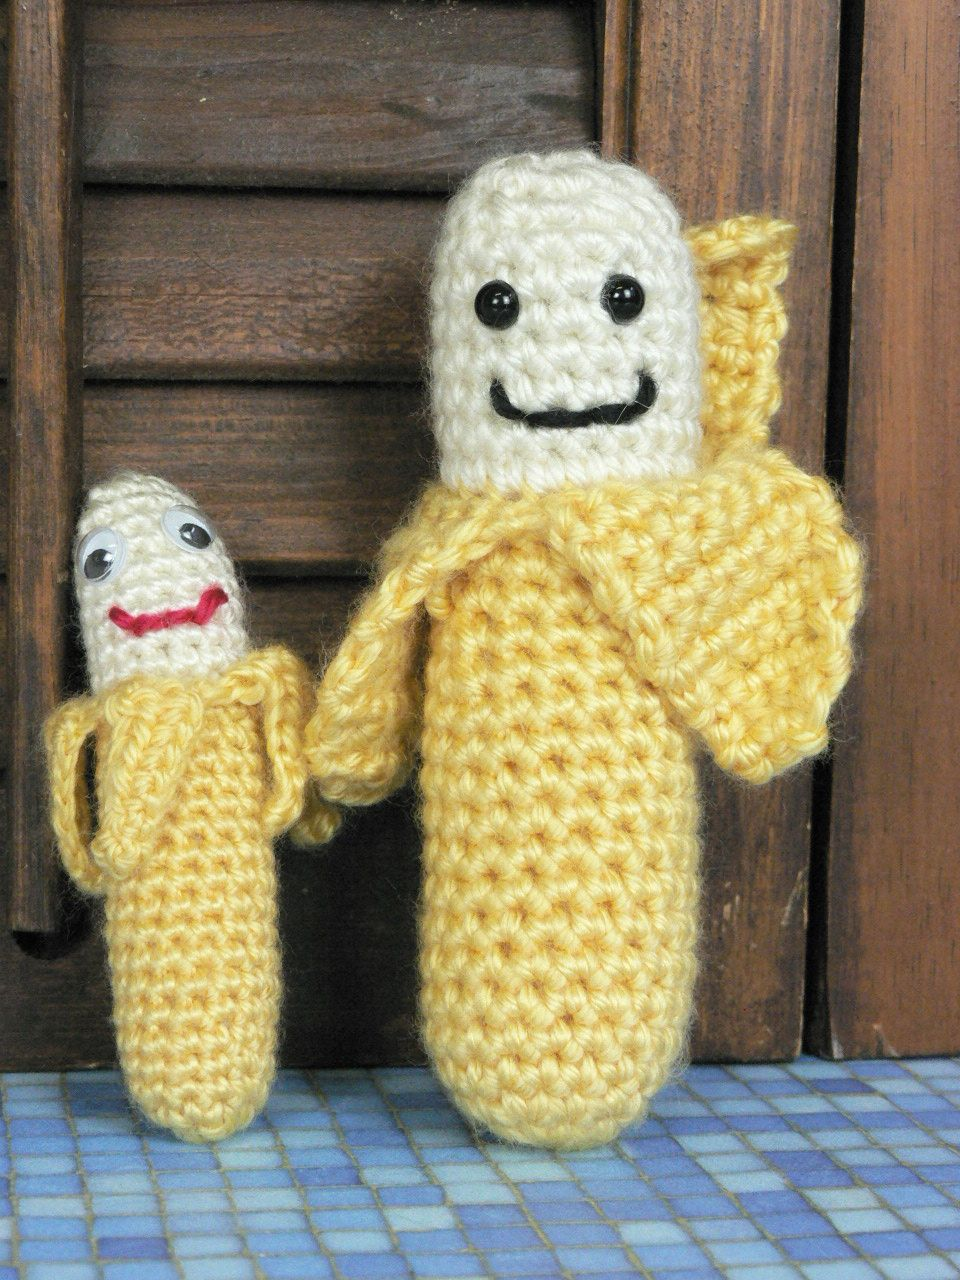 Bananas about bananas free crochet pattern crochet bananas about bananas free crochet pattern bankloansurffo Choice Image